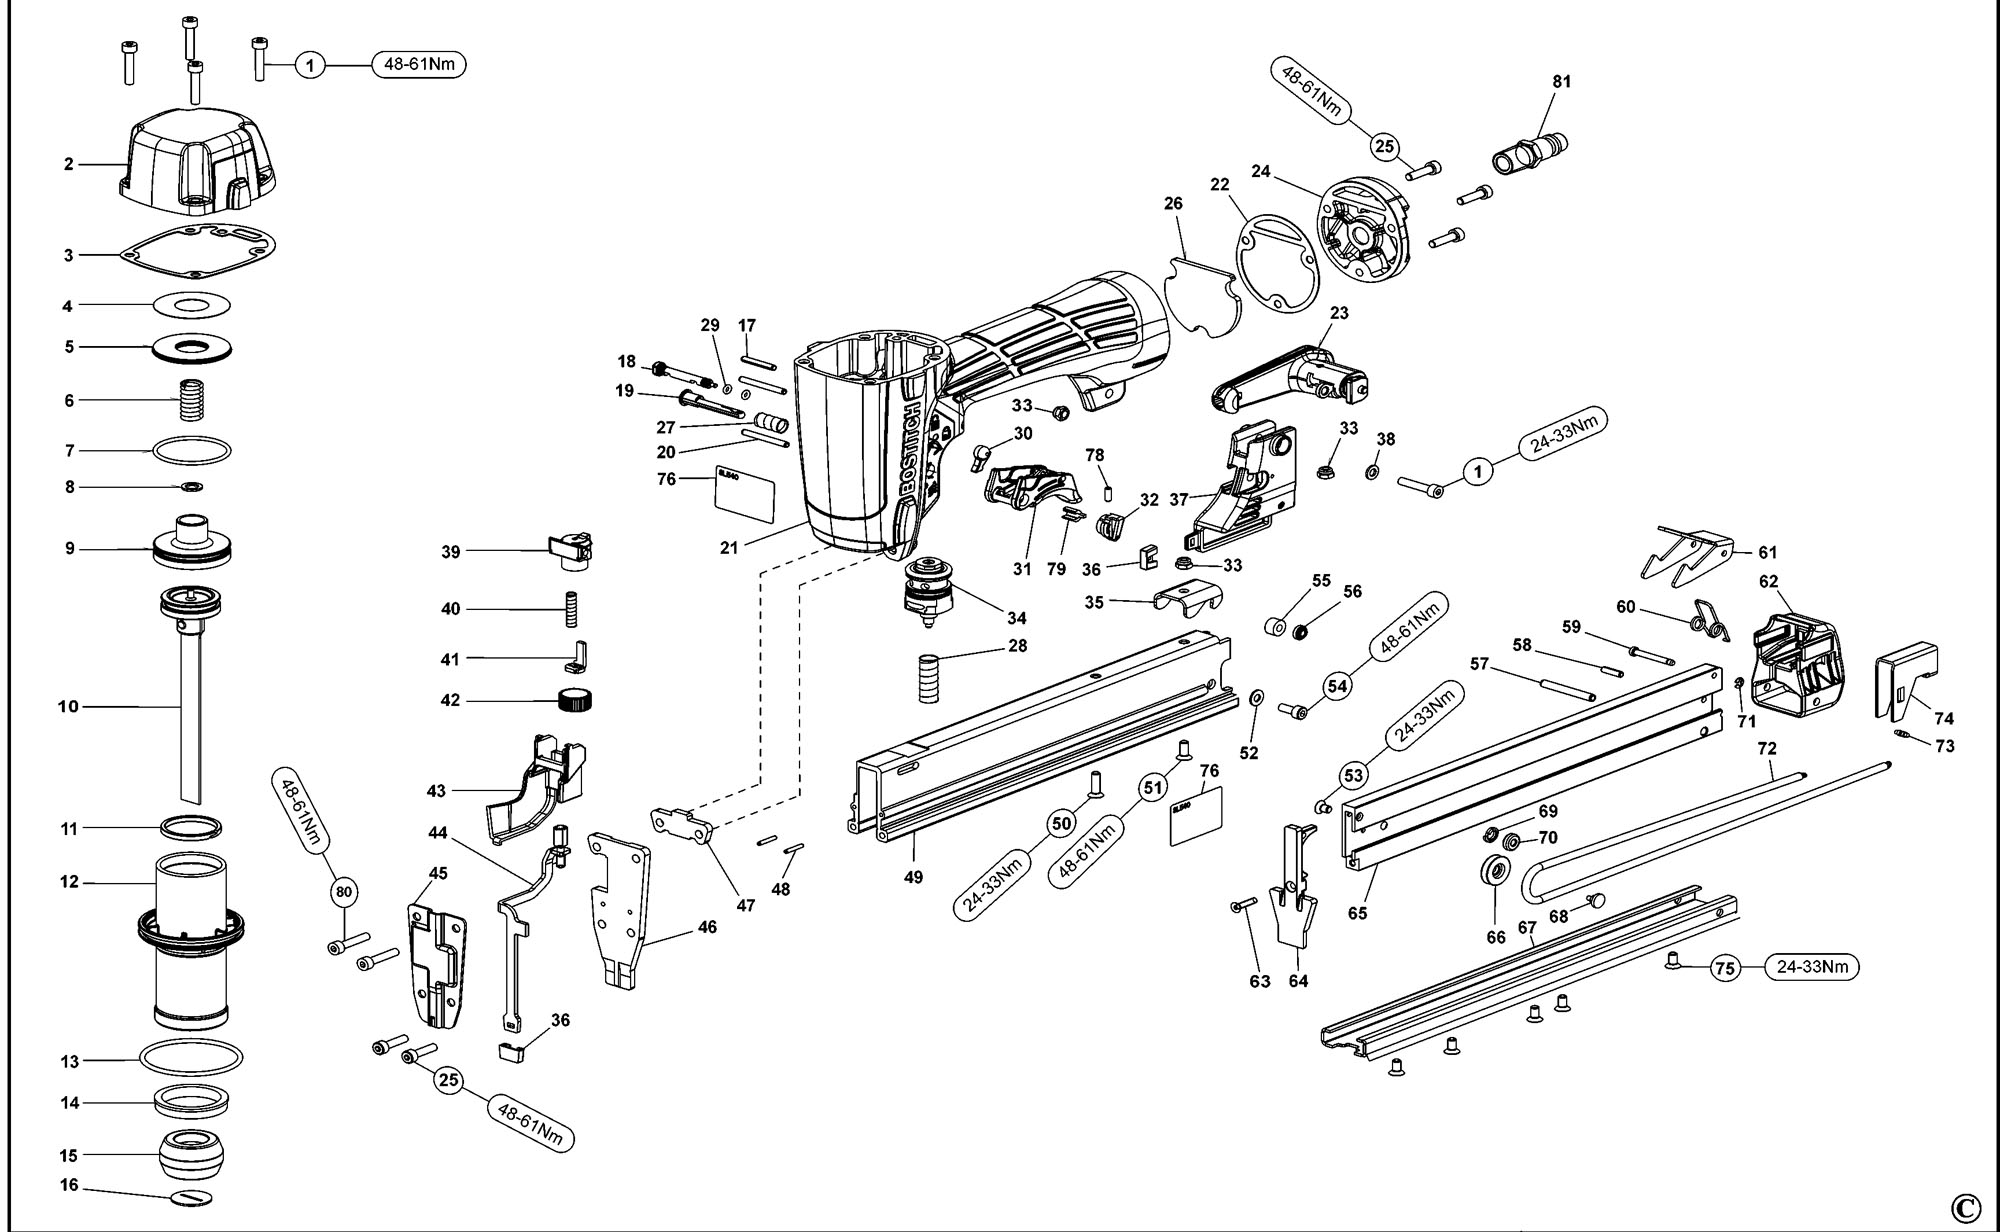 Spares For Bostitch Sl540 Pneumatic Stapler Type Reve